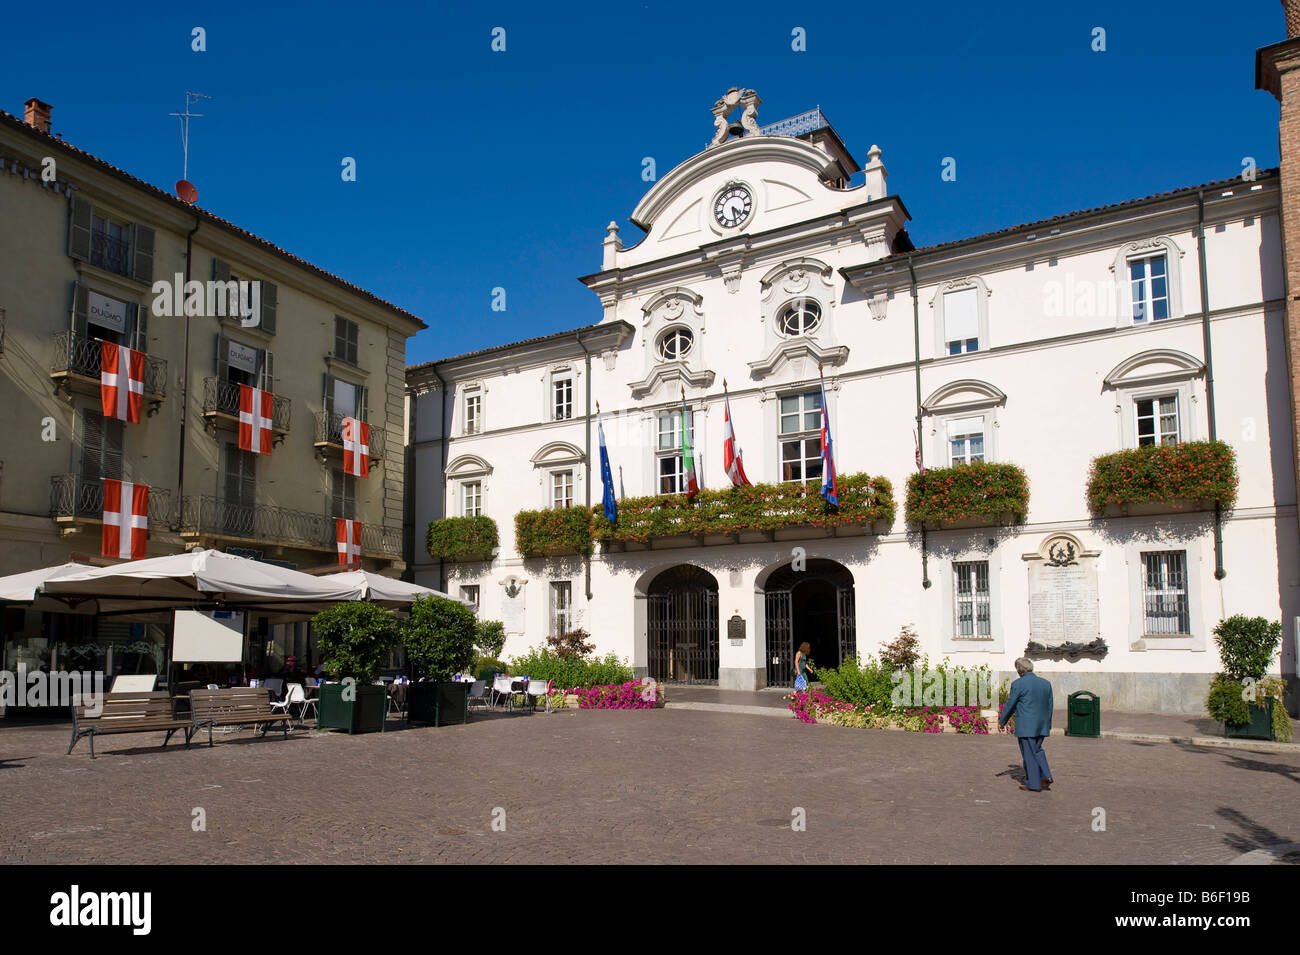 Townhall, townscape, Asti, Piemont, Italy, Europe Stock Photo